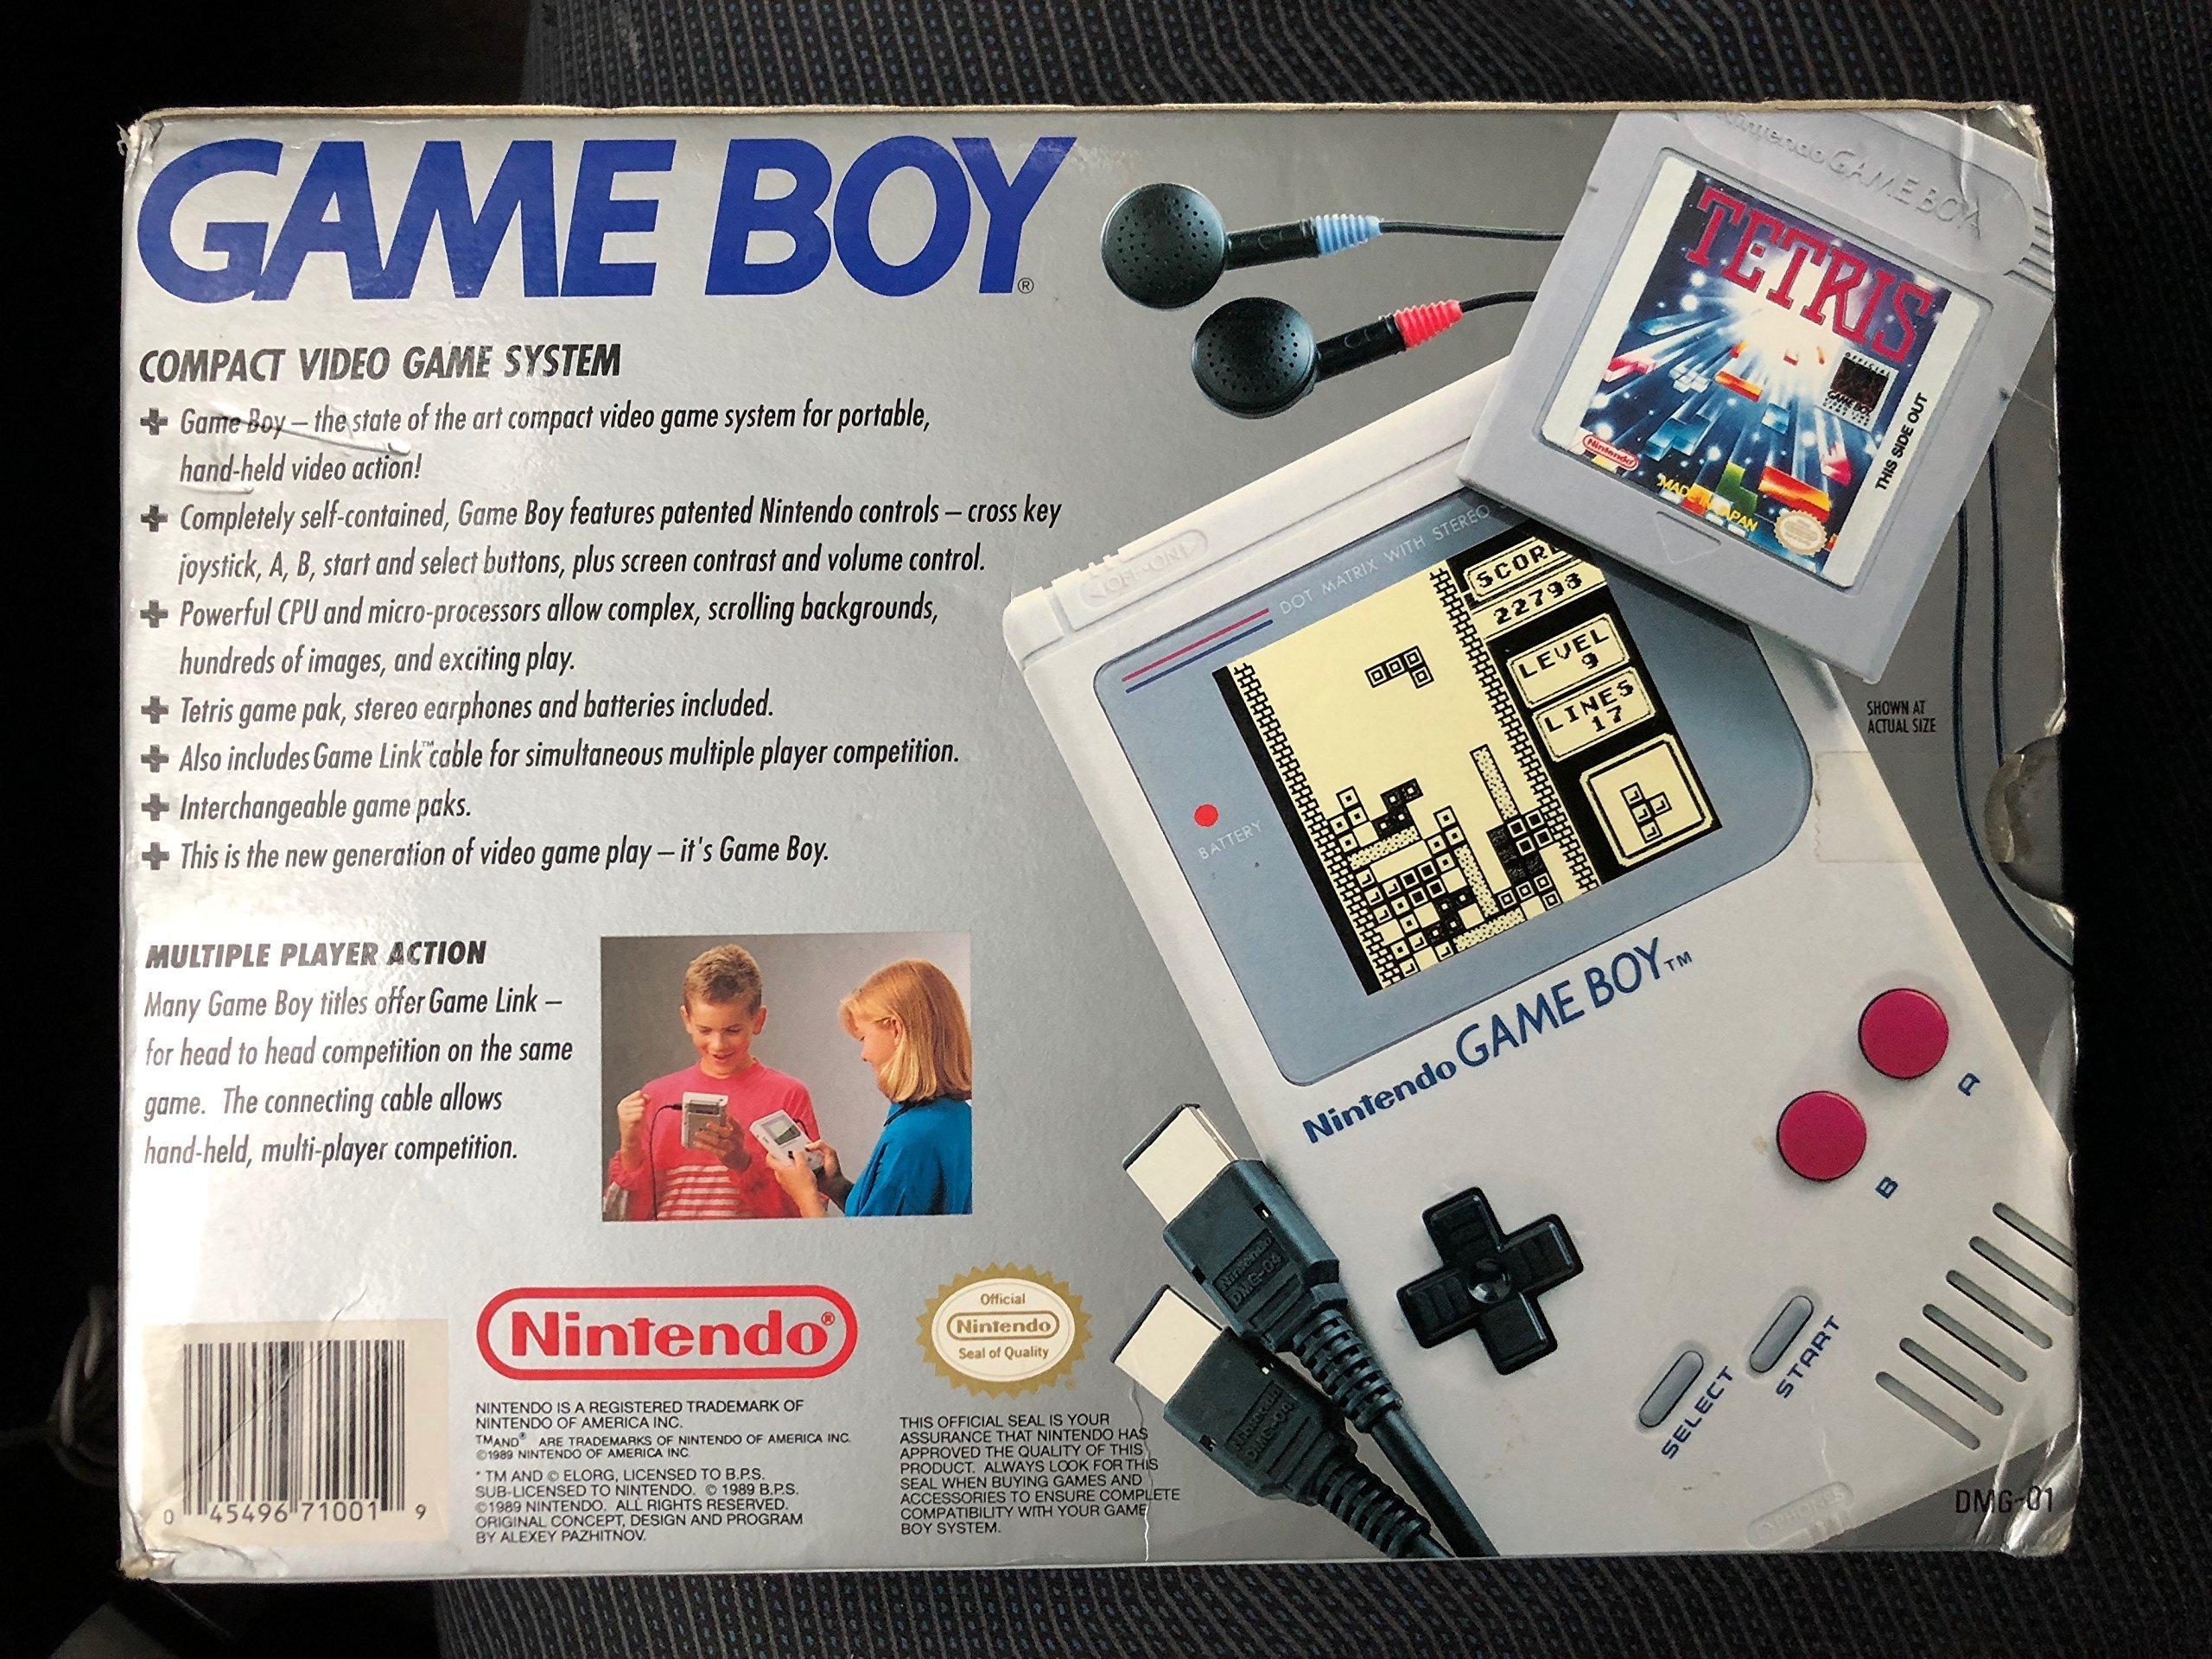 Game boy color quanto vale - Image Unavailable Image Not Available For Color Nintendo Game Boy